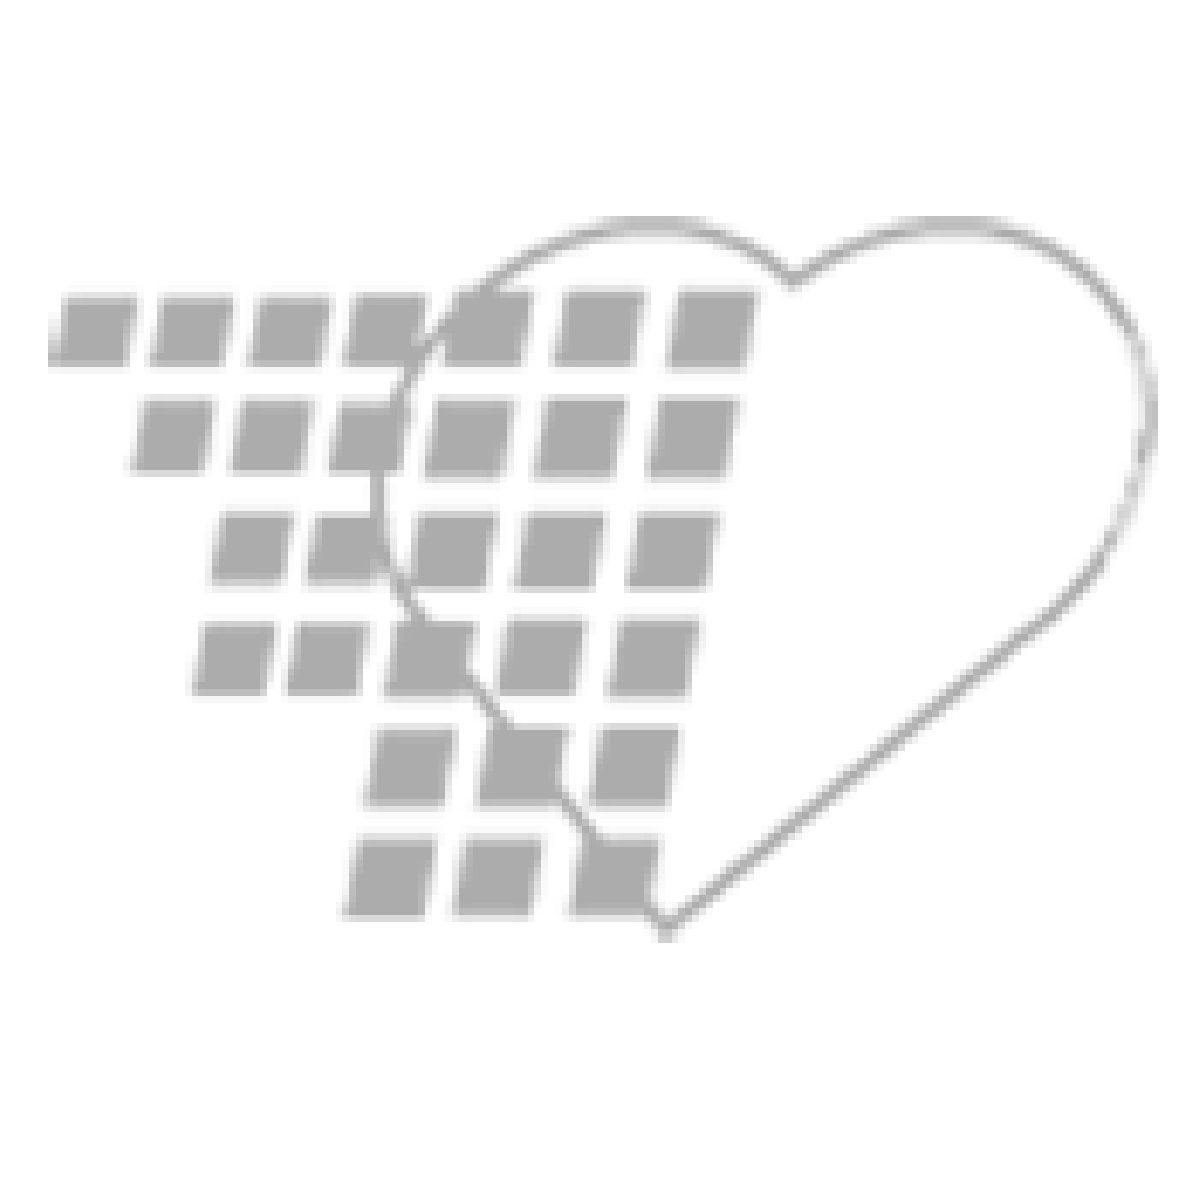 11-81-3617 Life/form® Deluxe Child CRiSis Manikin with ECG Simulator